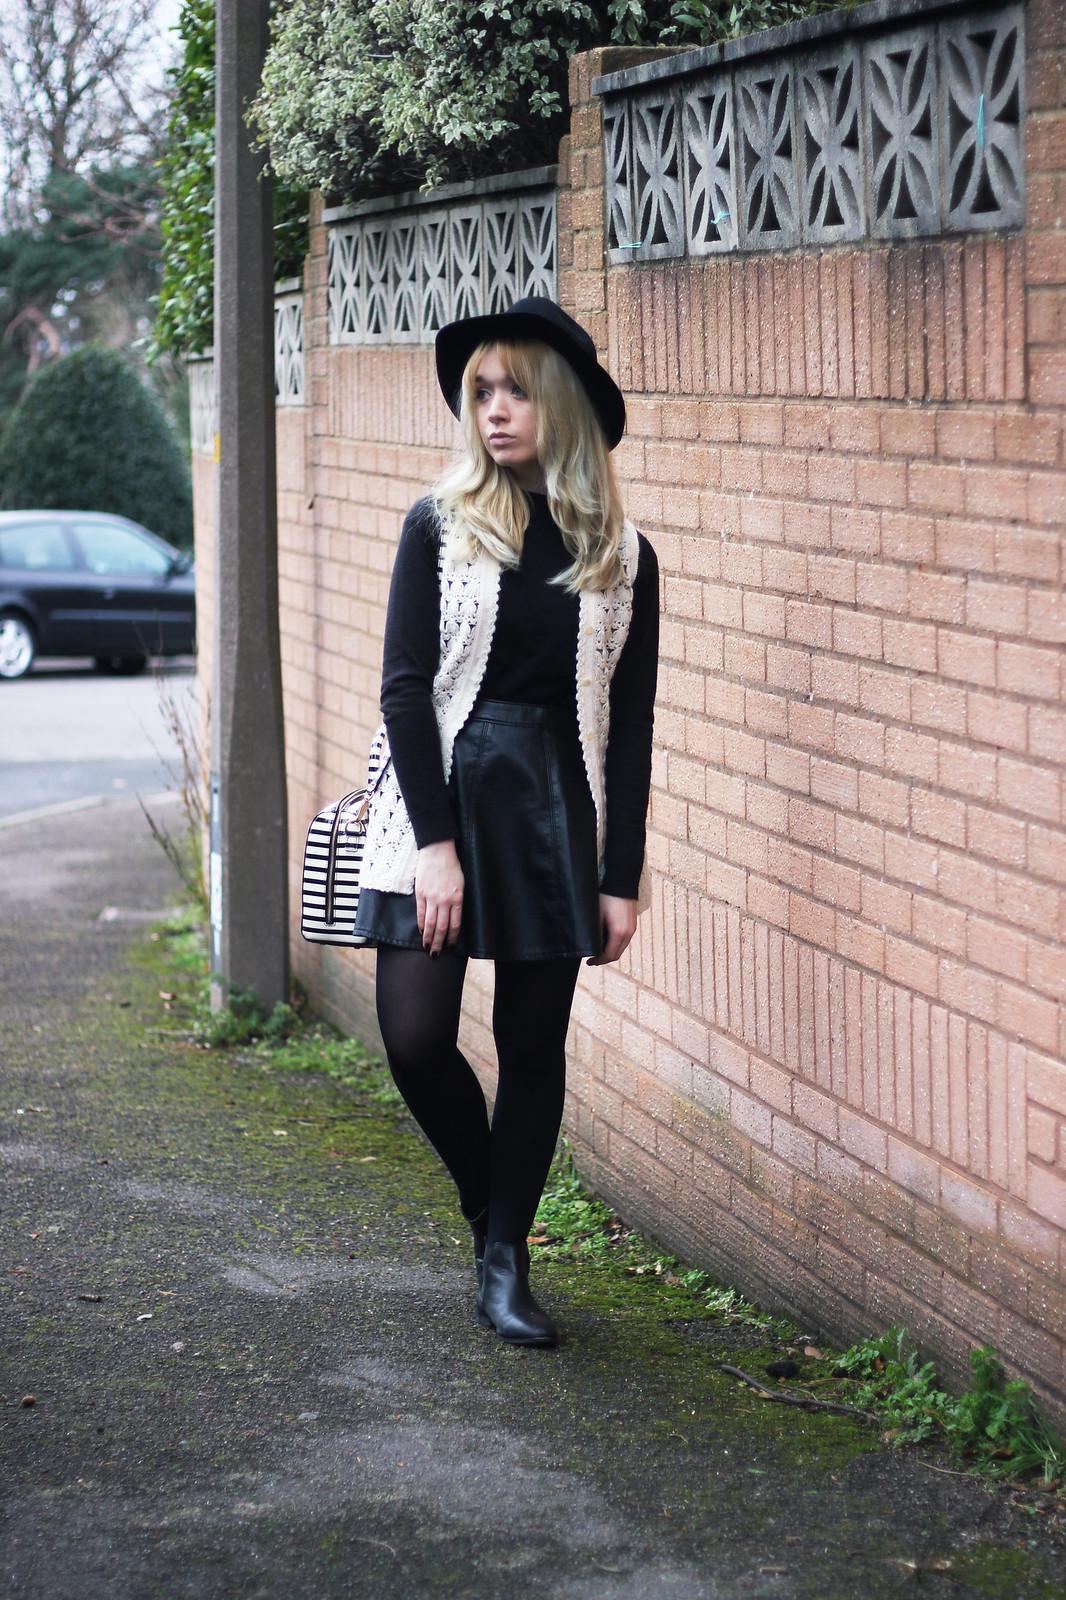 2-crochet-waistcoat-outfit, fashion-blogger-style, boho, mod